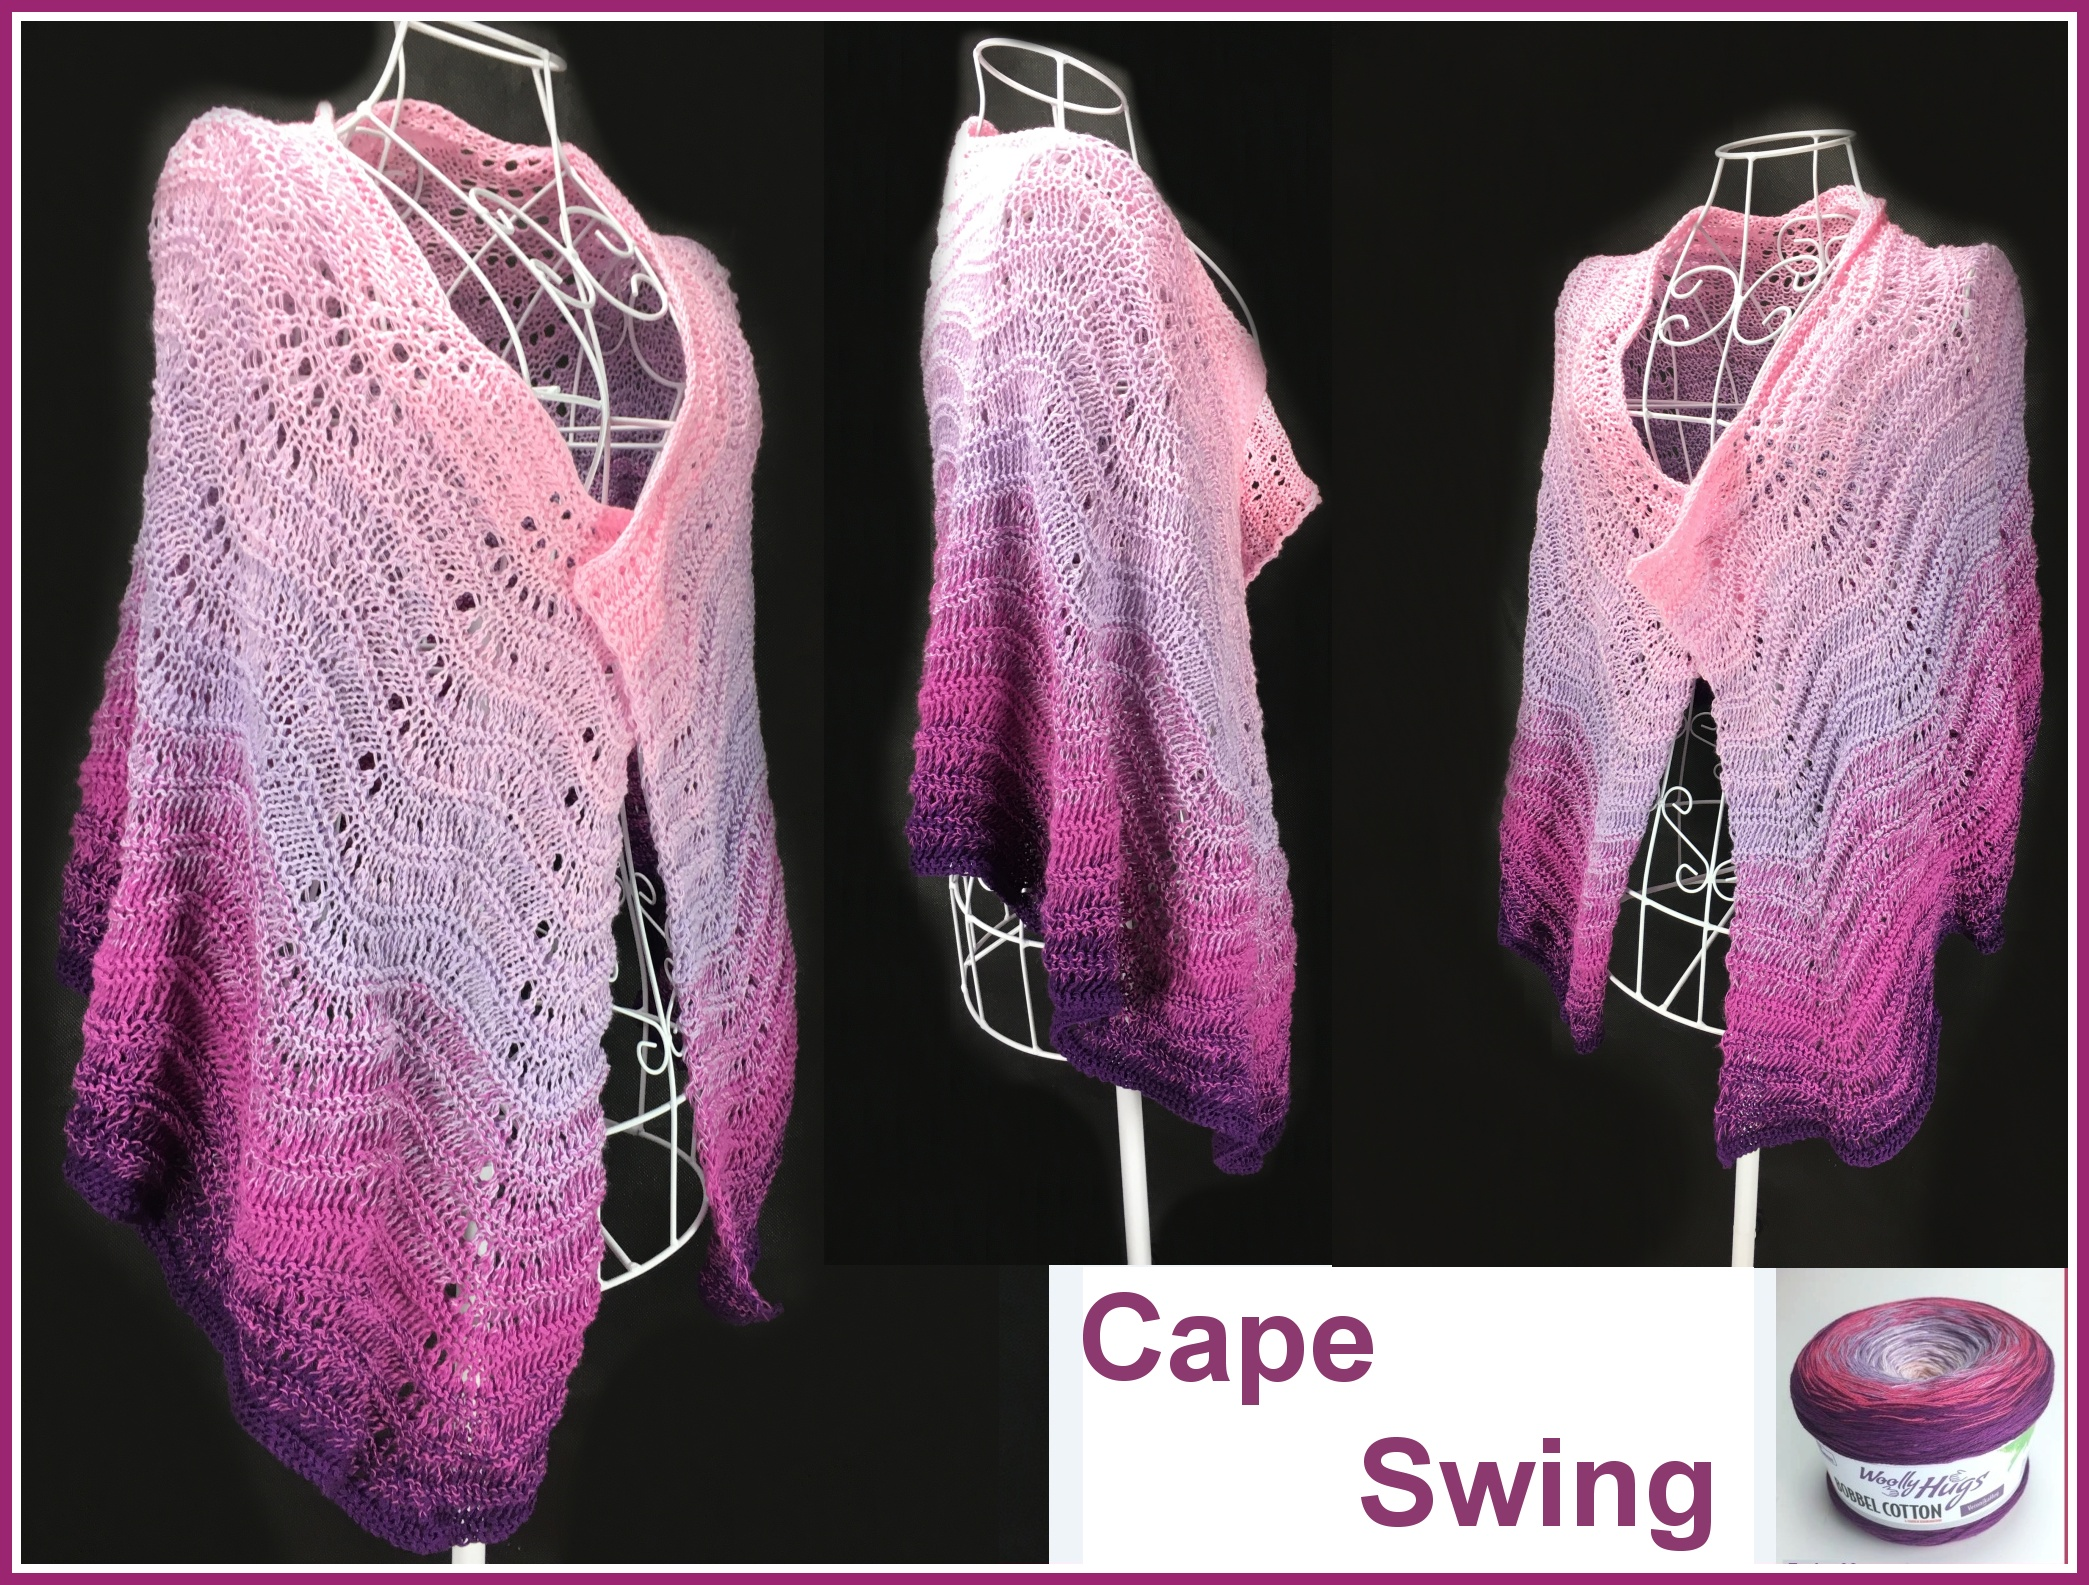 Cape Swing Collage